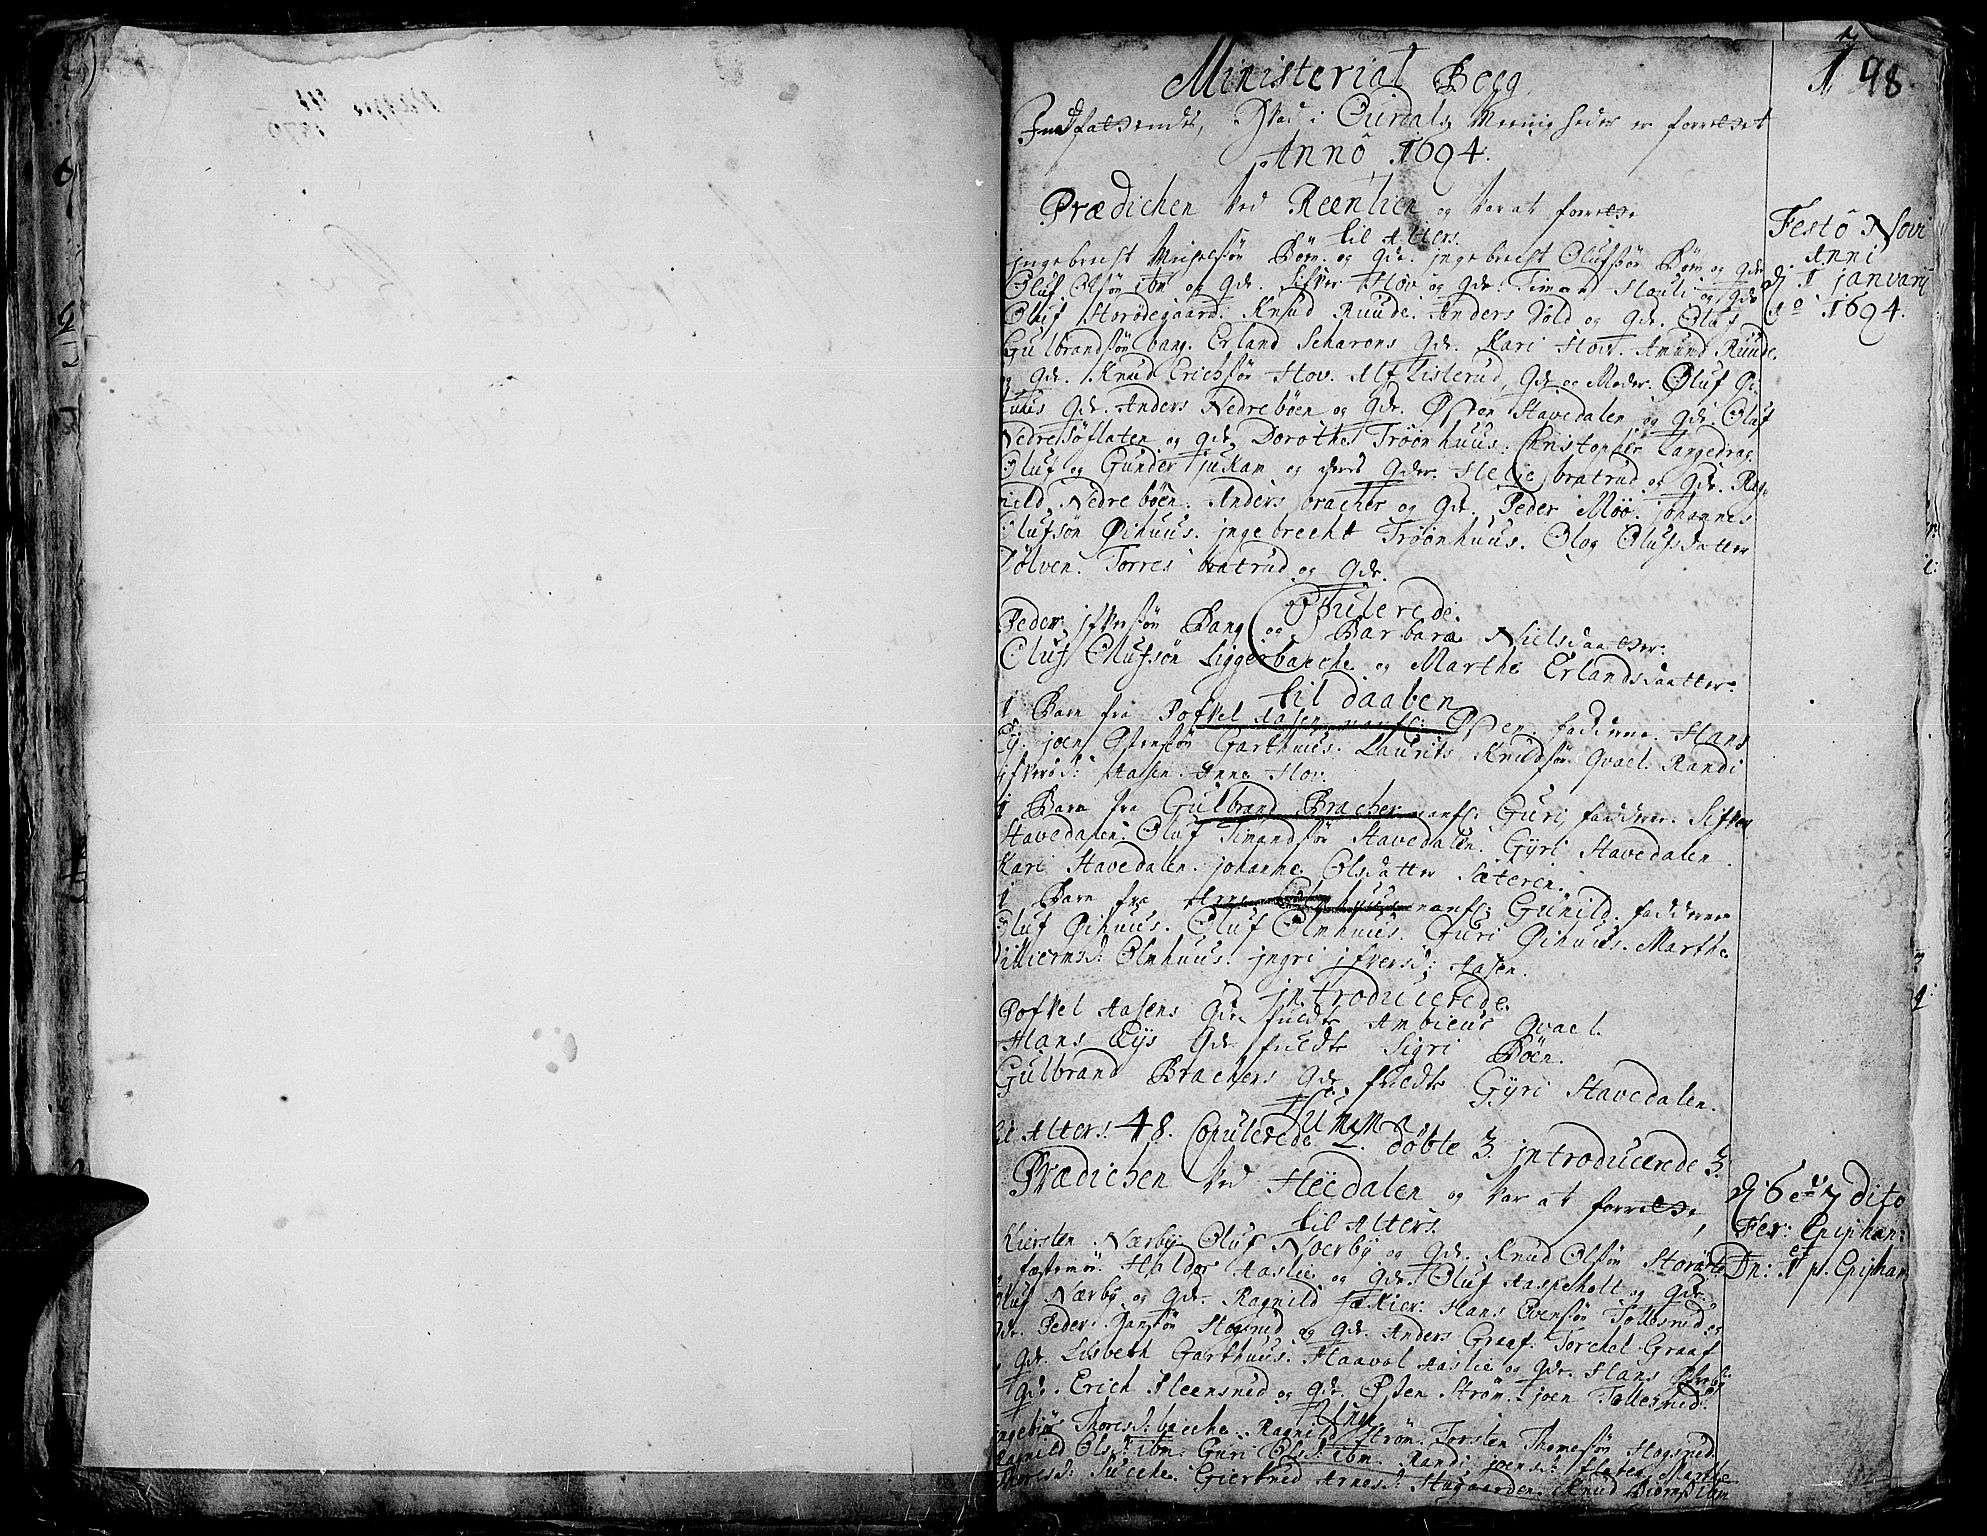 SAH, Aurdal prestekontor, Ministerialbok nr. 1-3, 1692-1730, s. 48